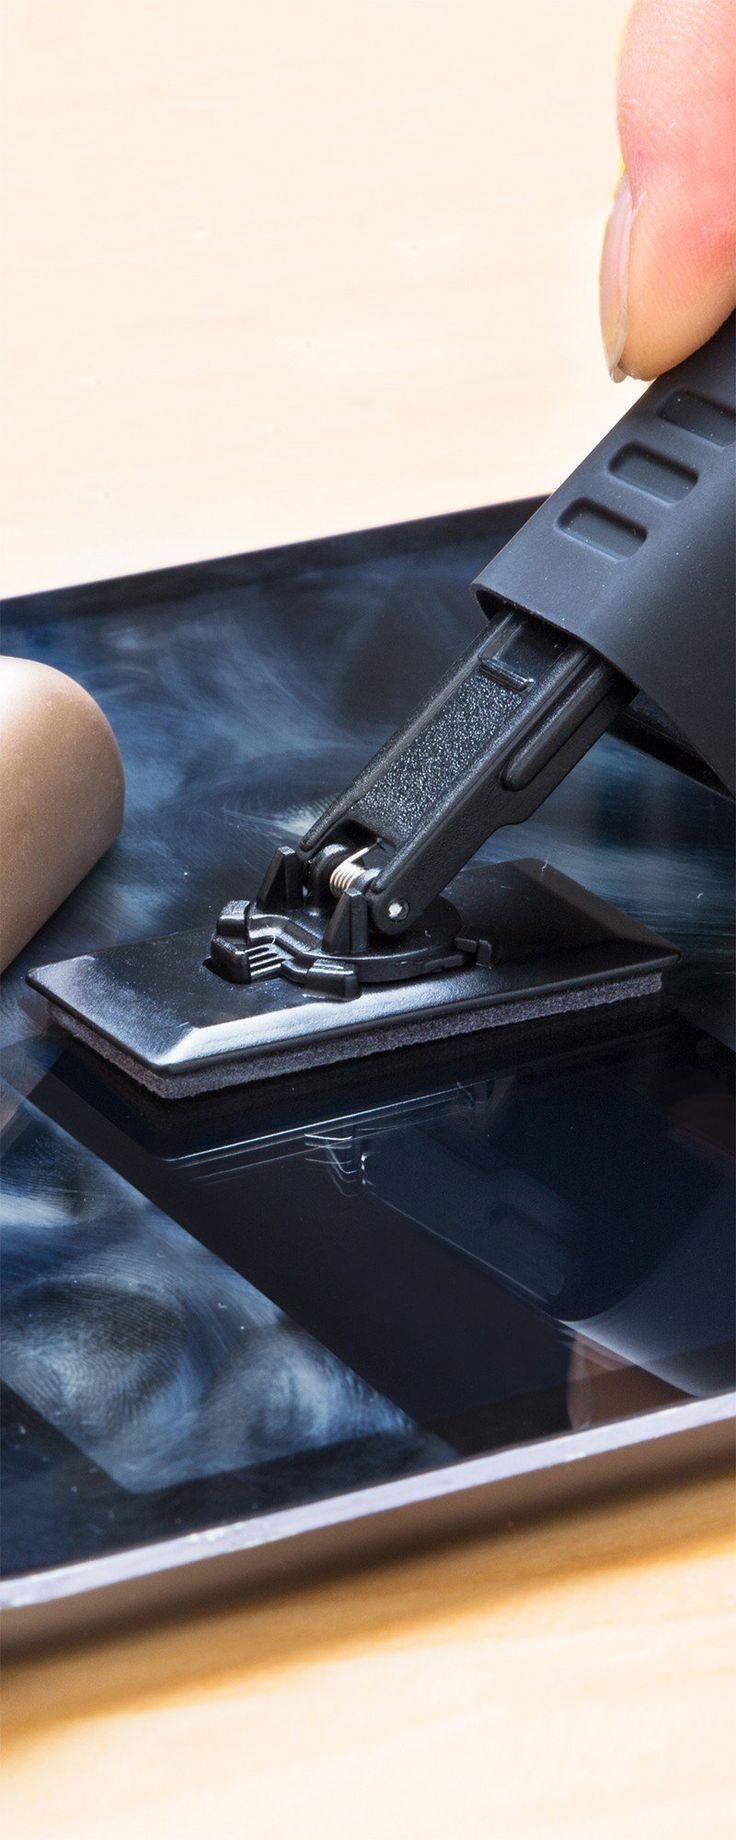 how to clean fingerprints off computer screen